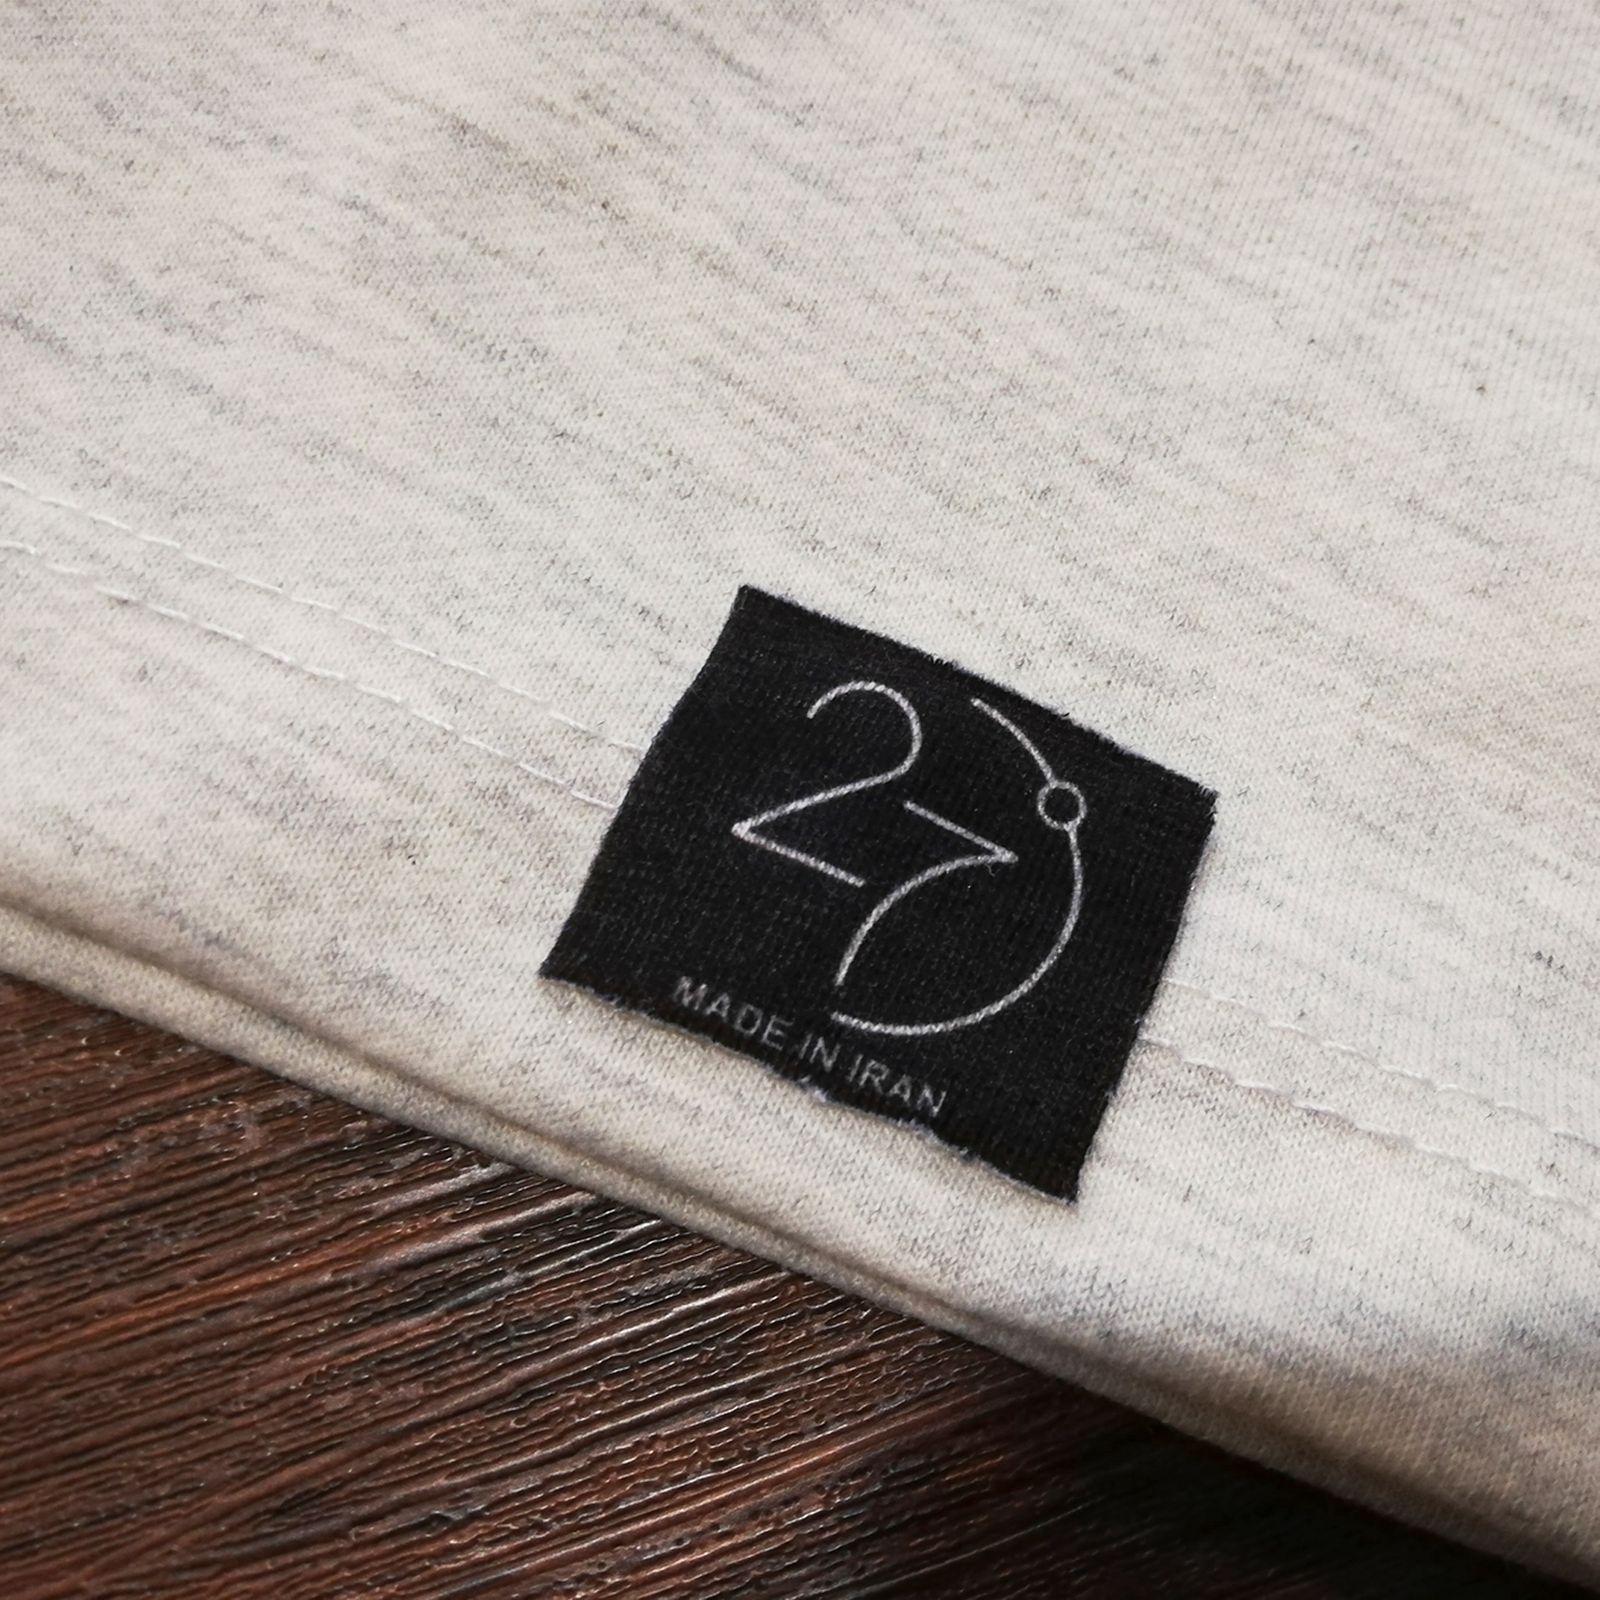 تی شرت مردانه 27  طرح هیچ کد B125 -  - 5